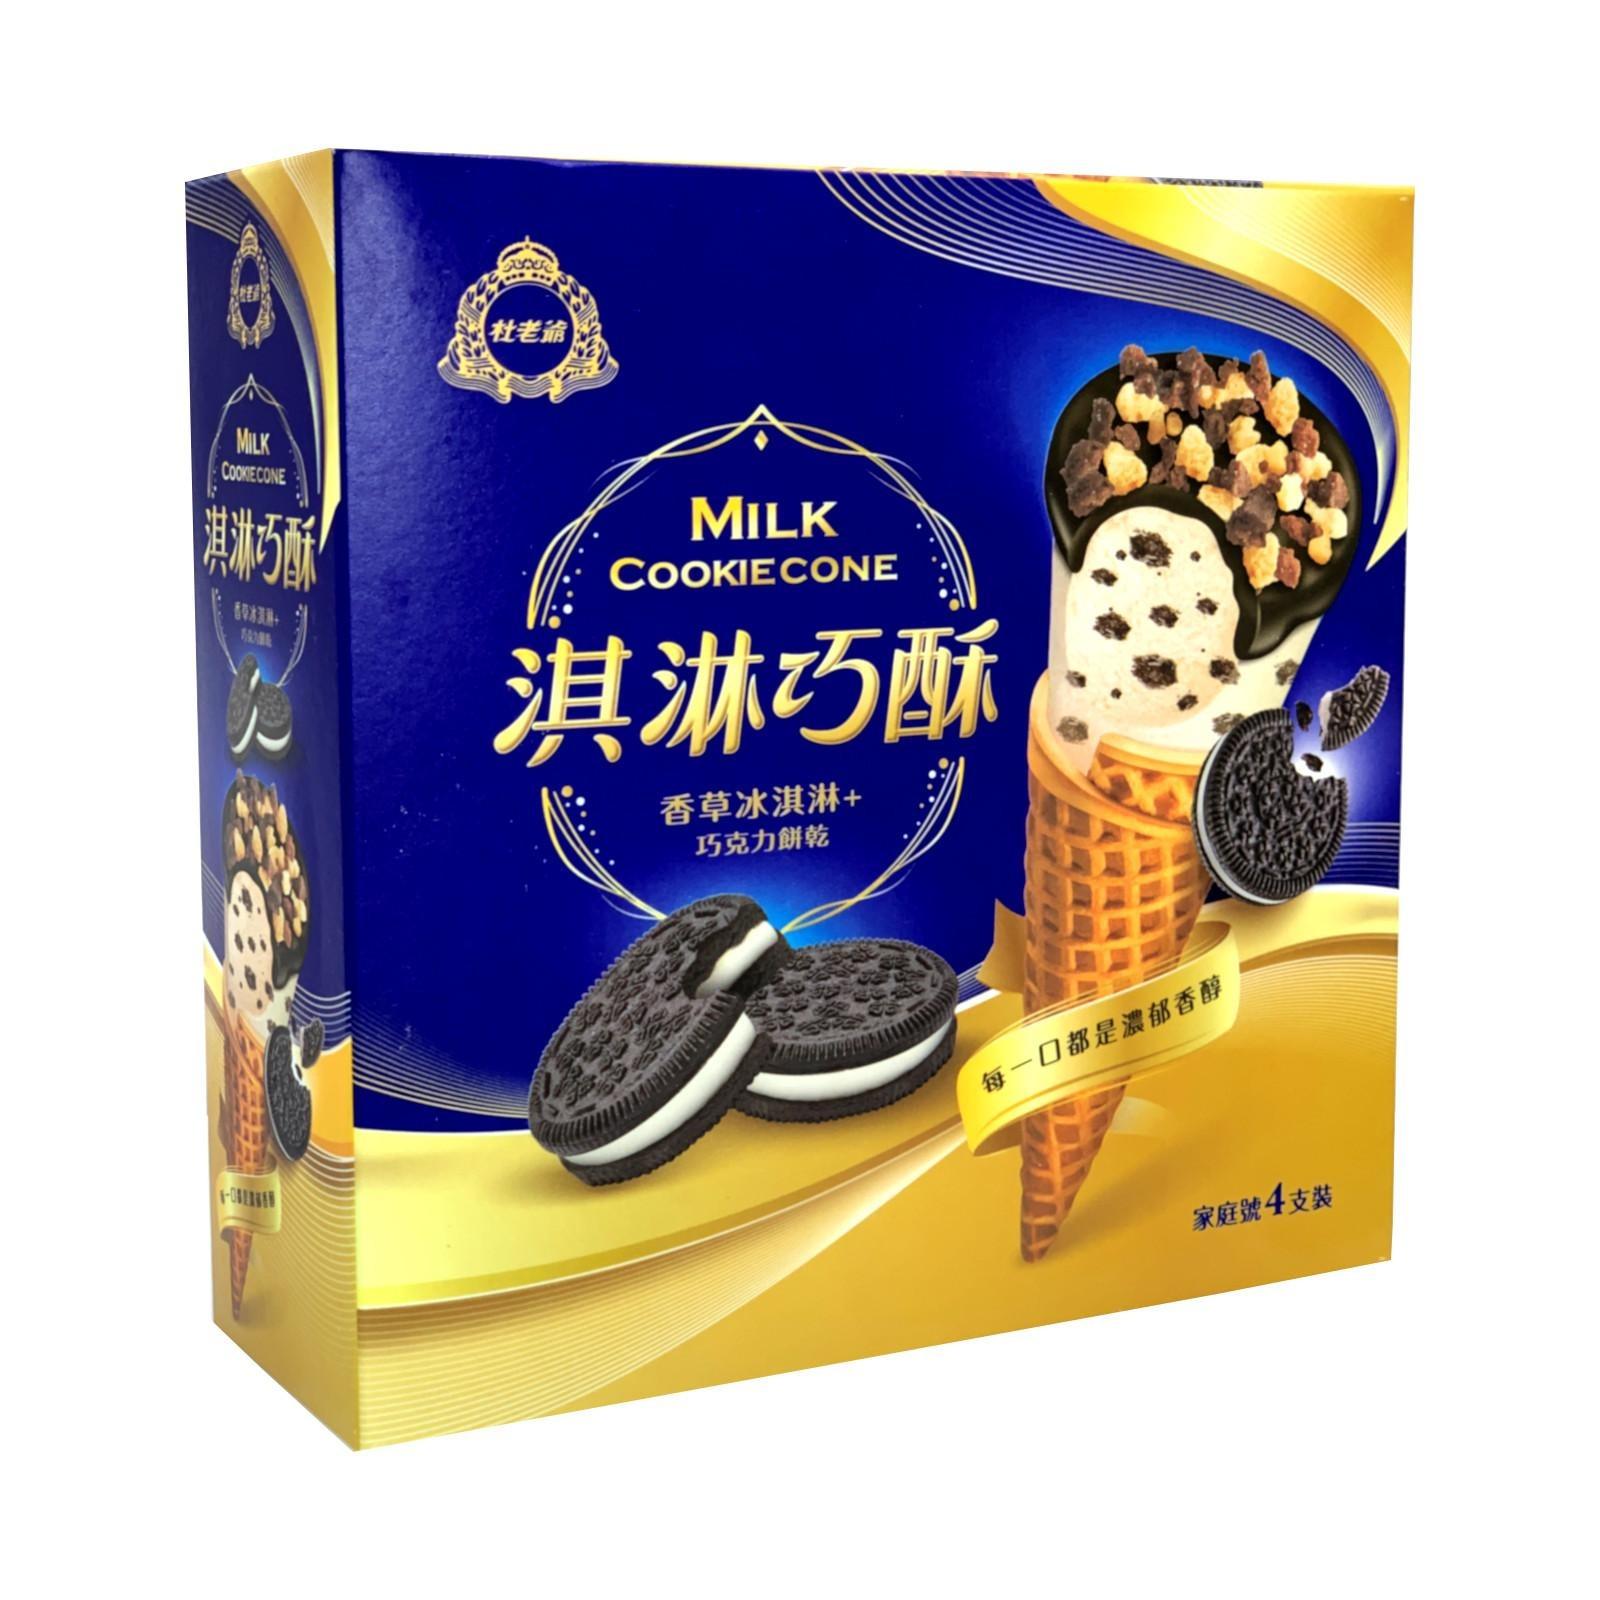 Duroyal Chocolate Cookies and Cream Cone Ice Cream